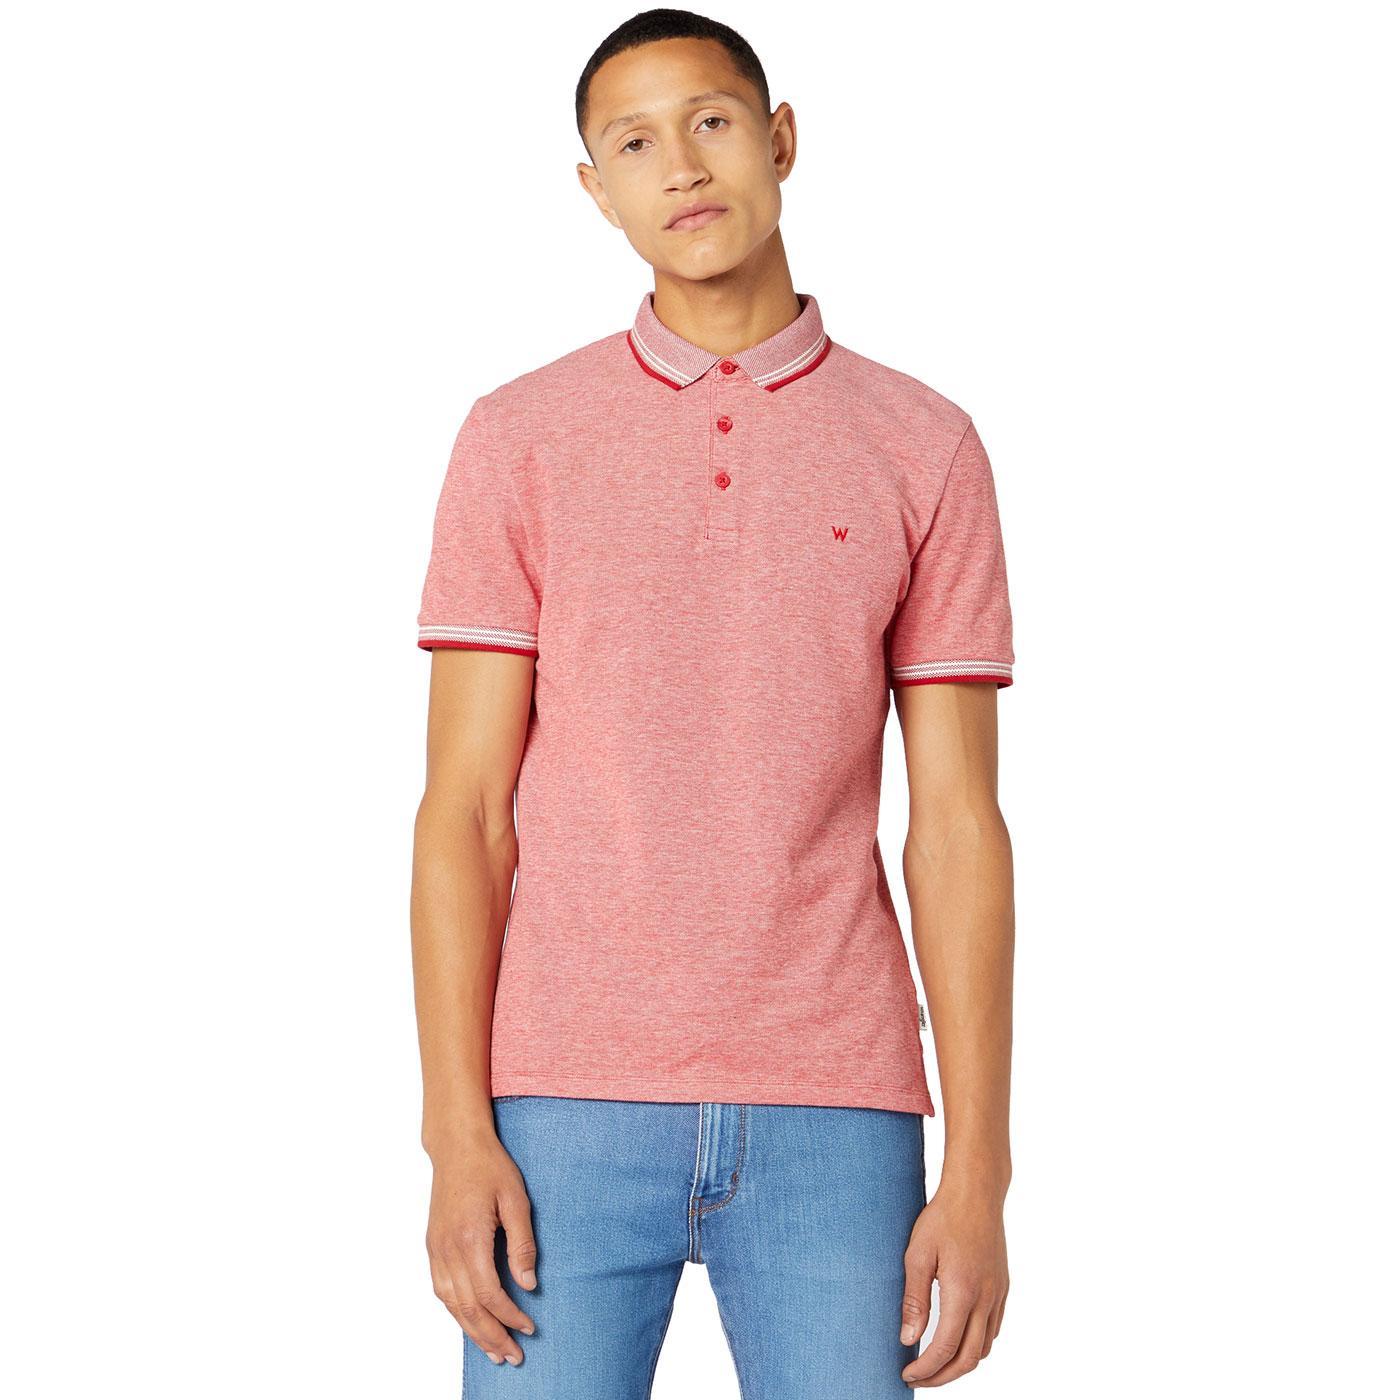 Wrangler Men's Retro Refined Pique Polo Shirt FR